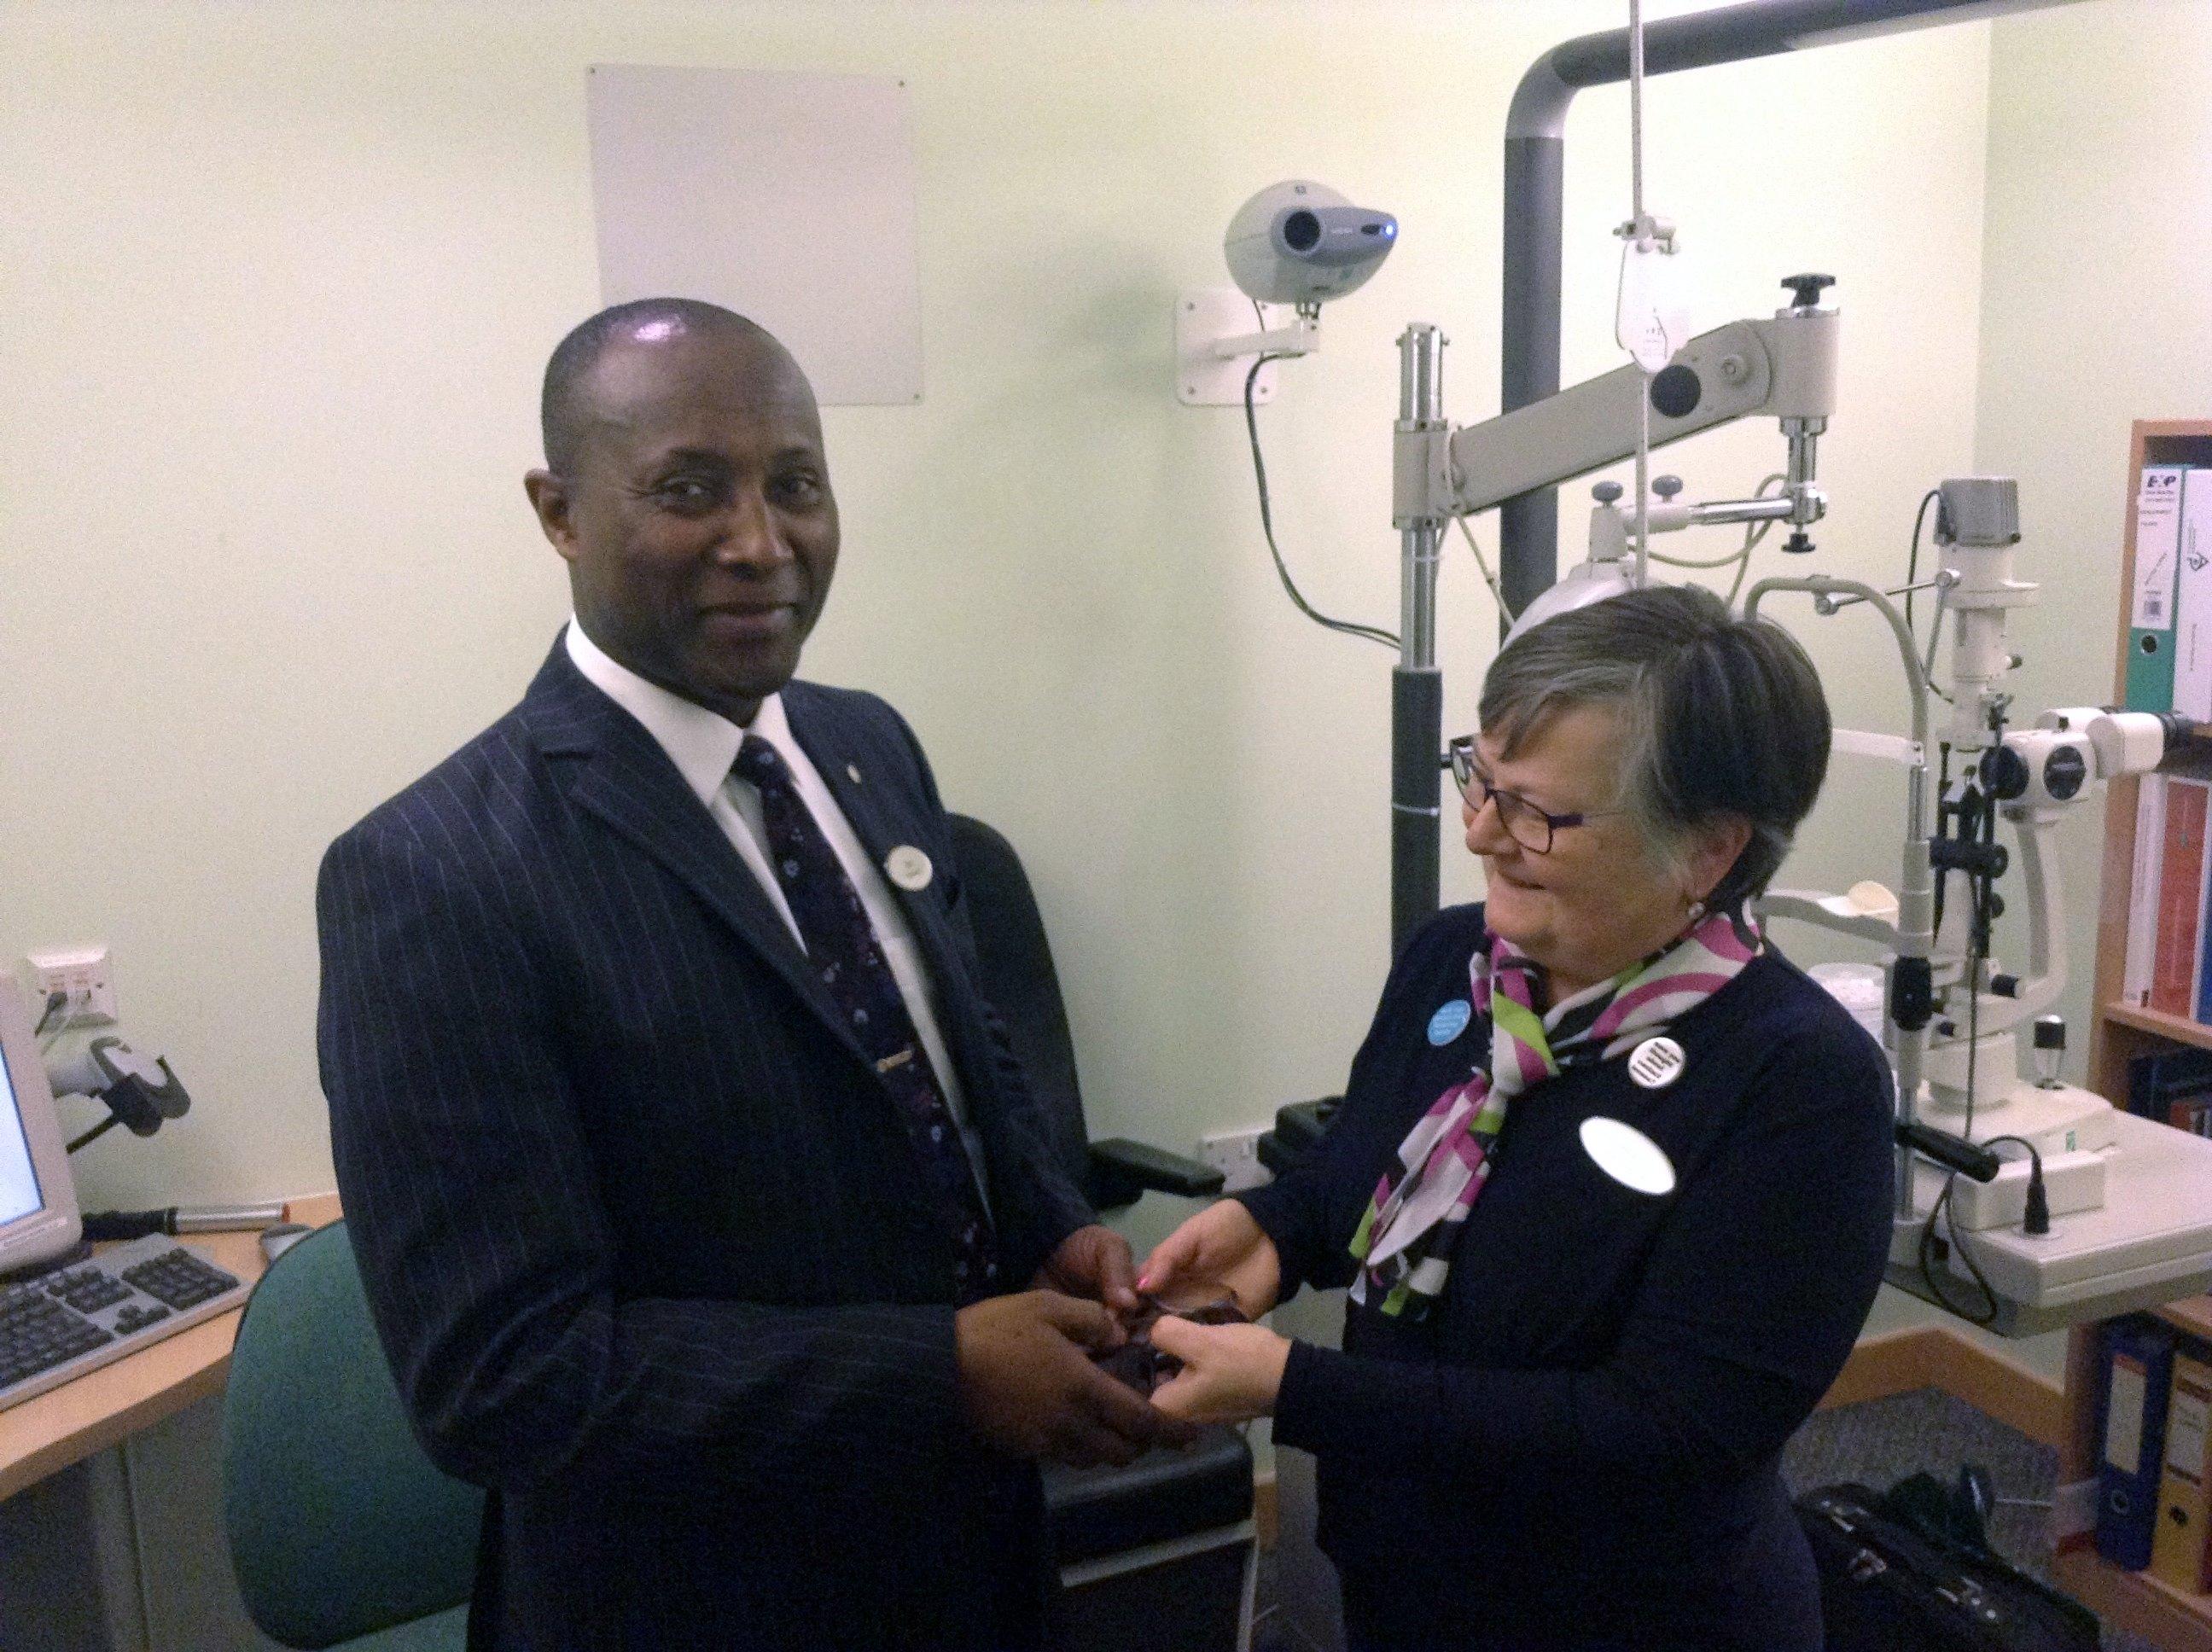 Sam Ekuful with Specsavers Ashford staff member, Rita Kegos